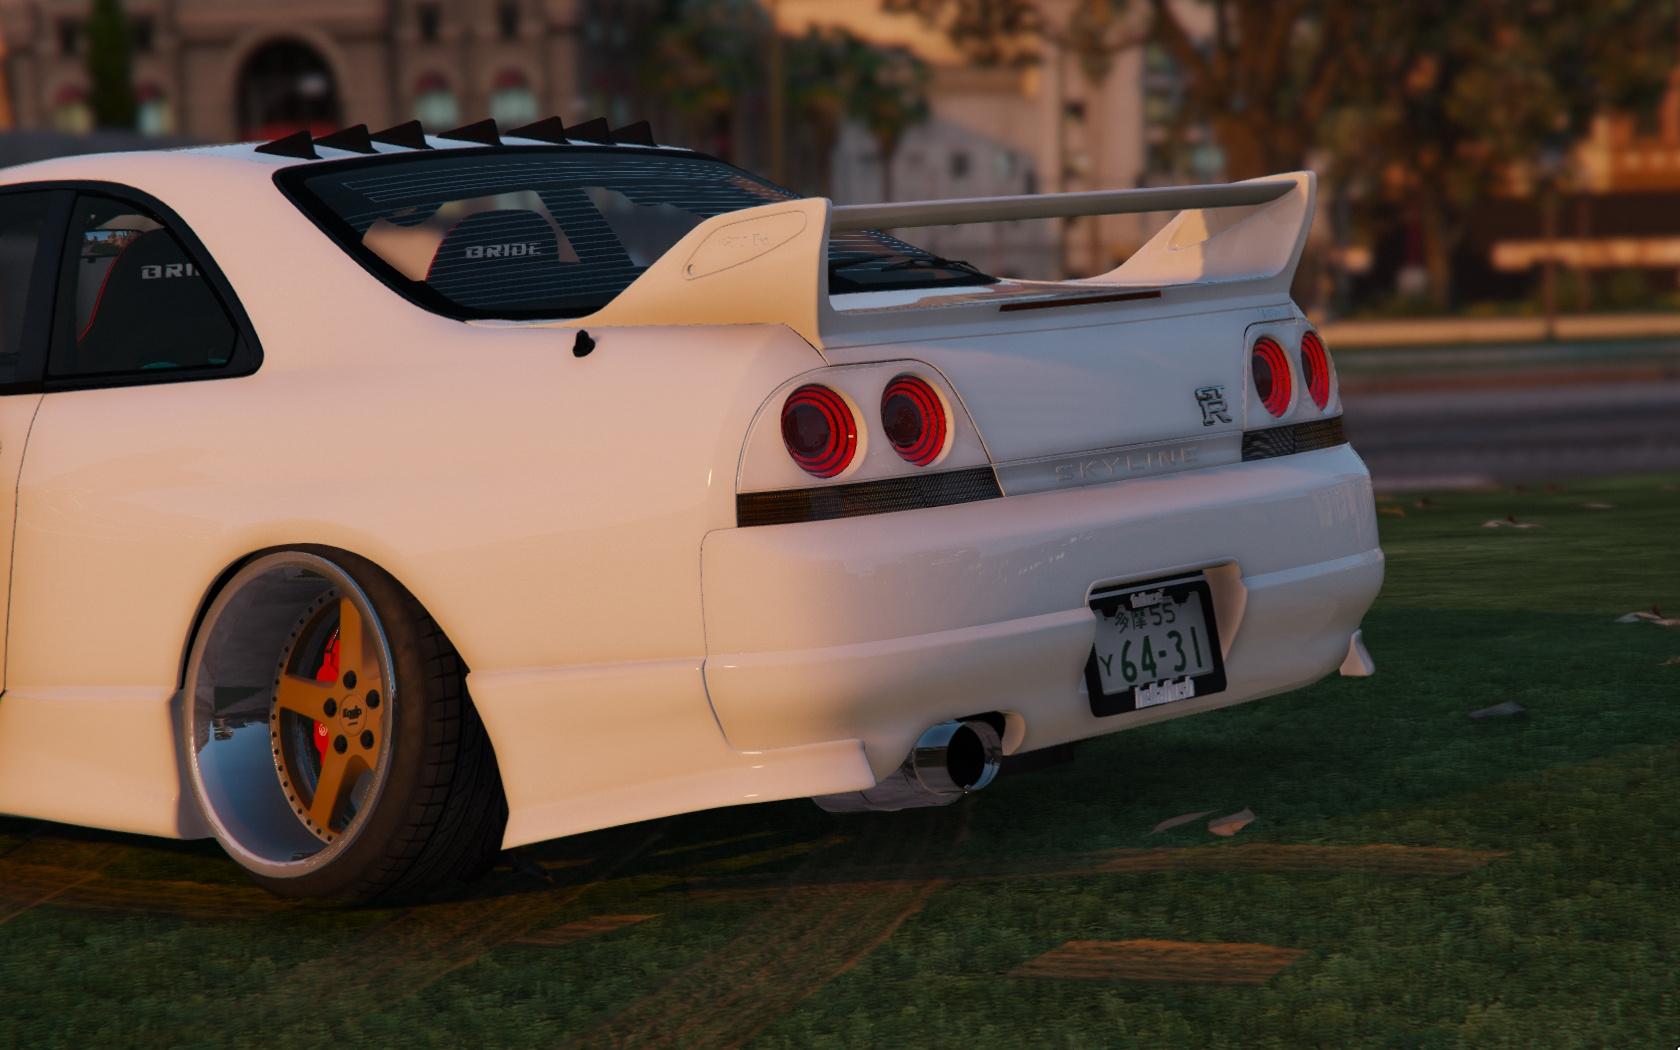 Nissan GTR R33 Stance [Tuning / Template] - GTA5-Mods com